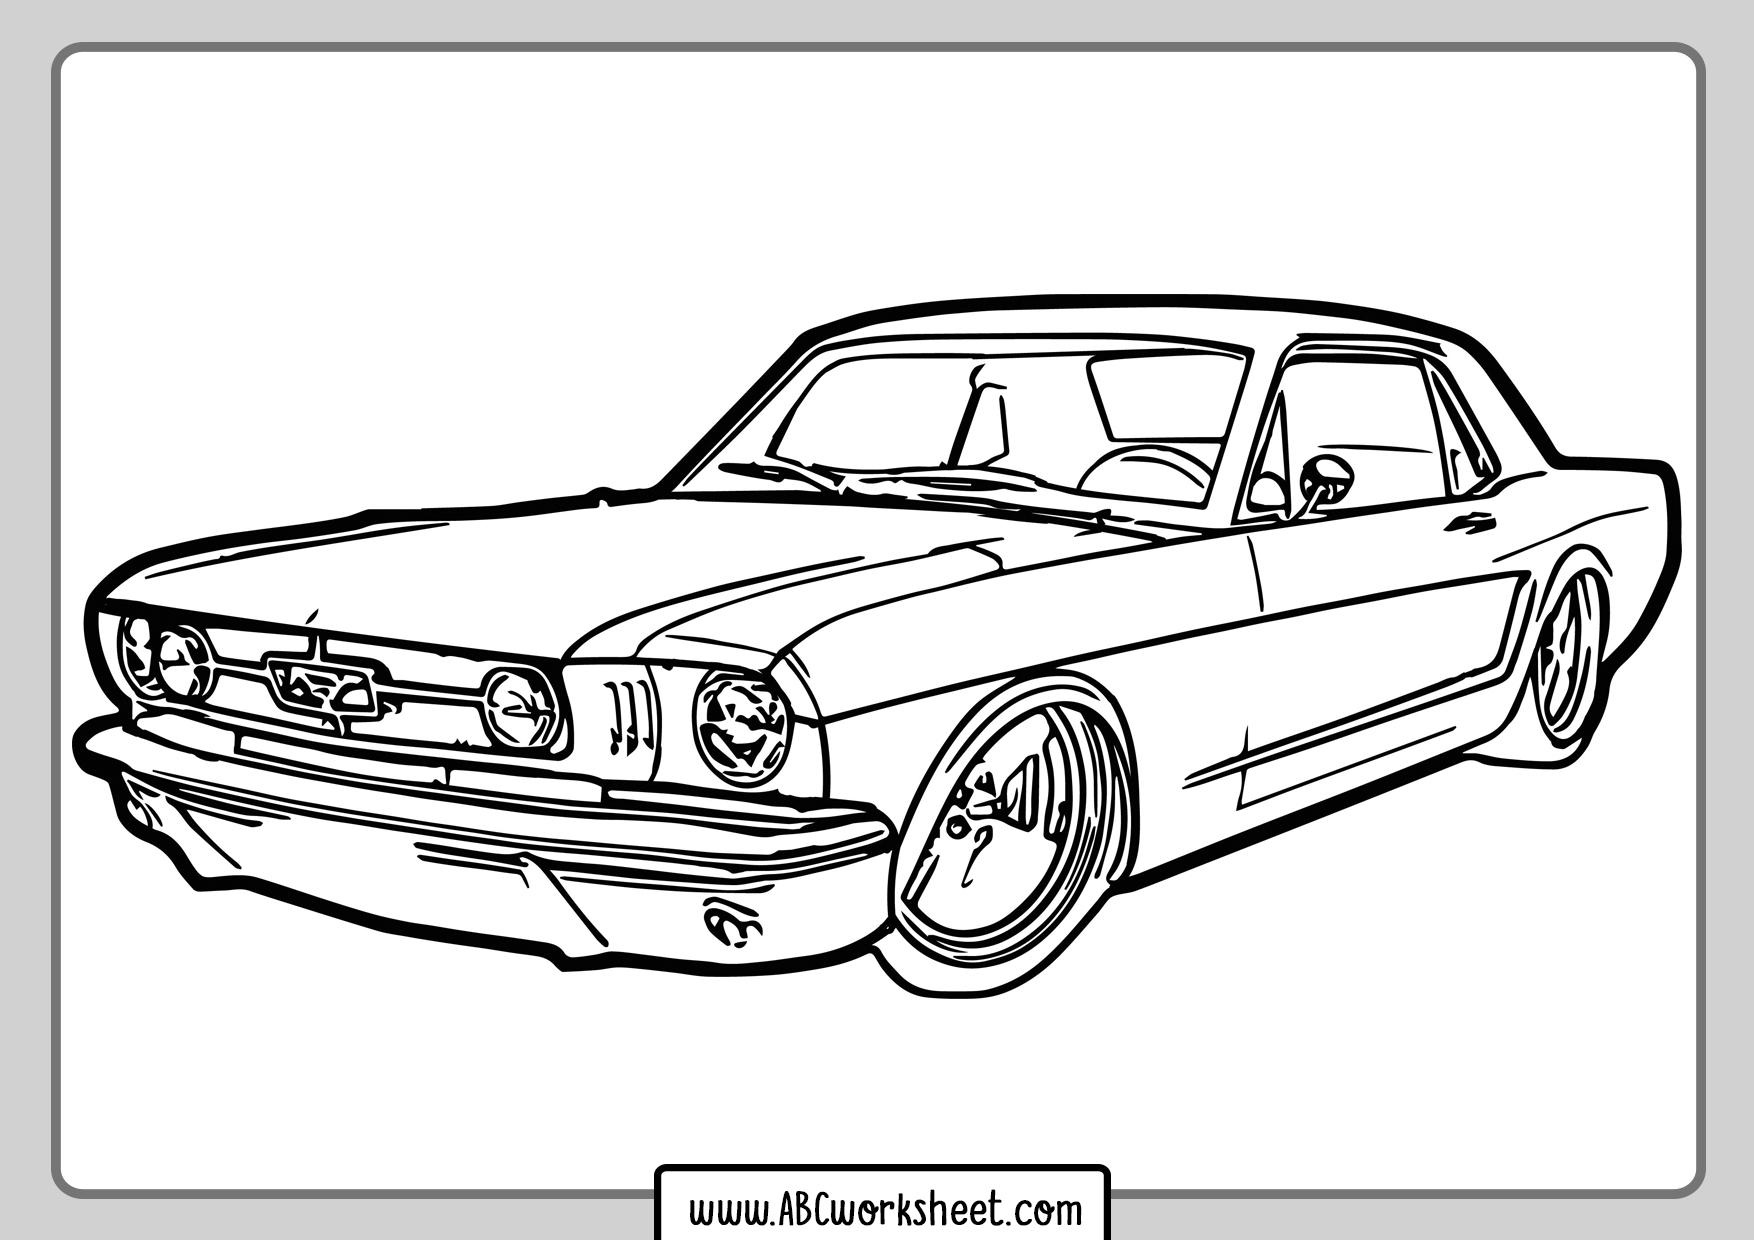 Printable Racing Car Coloring Page